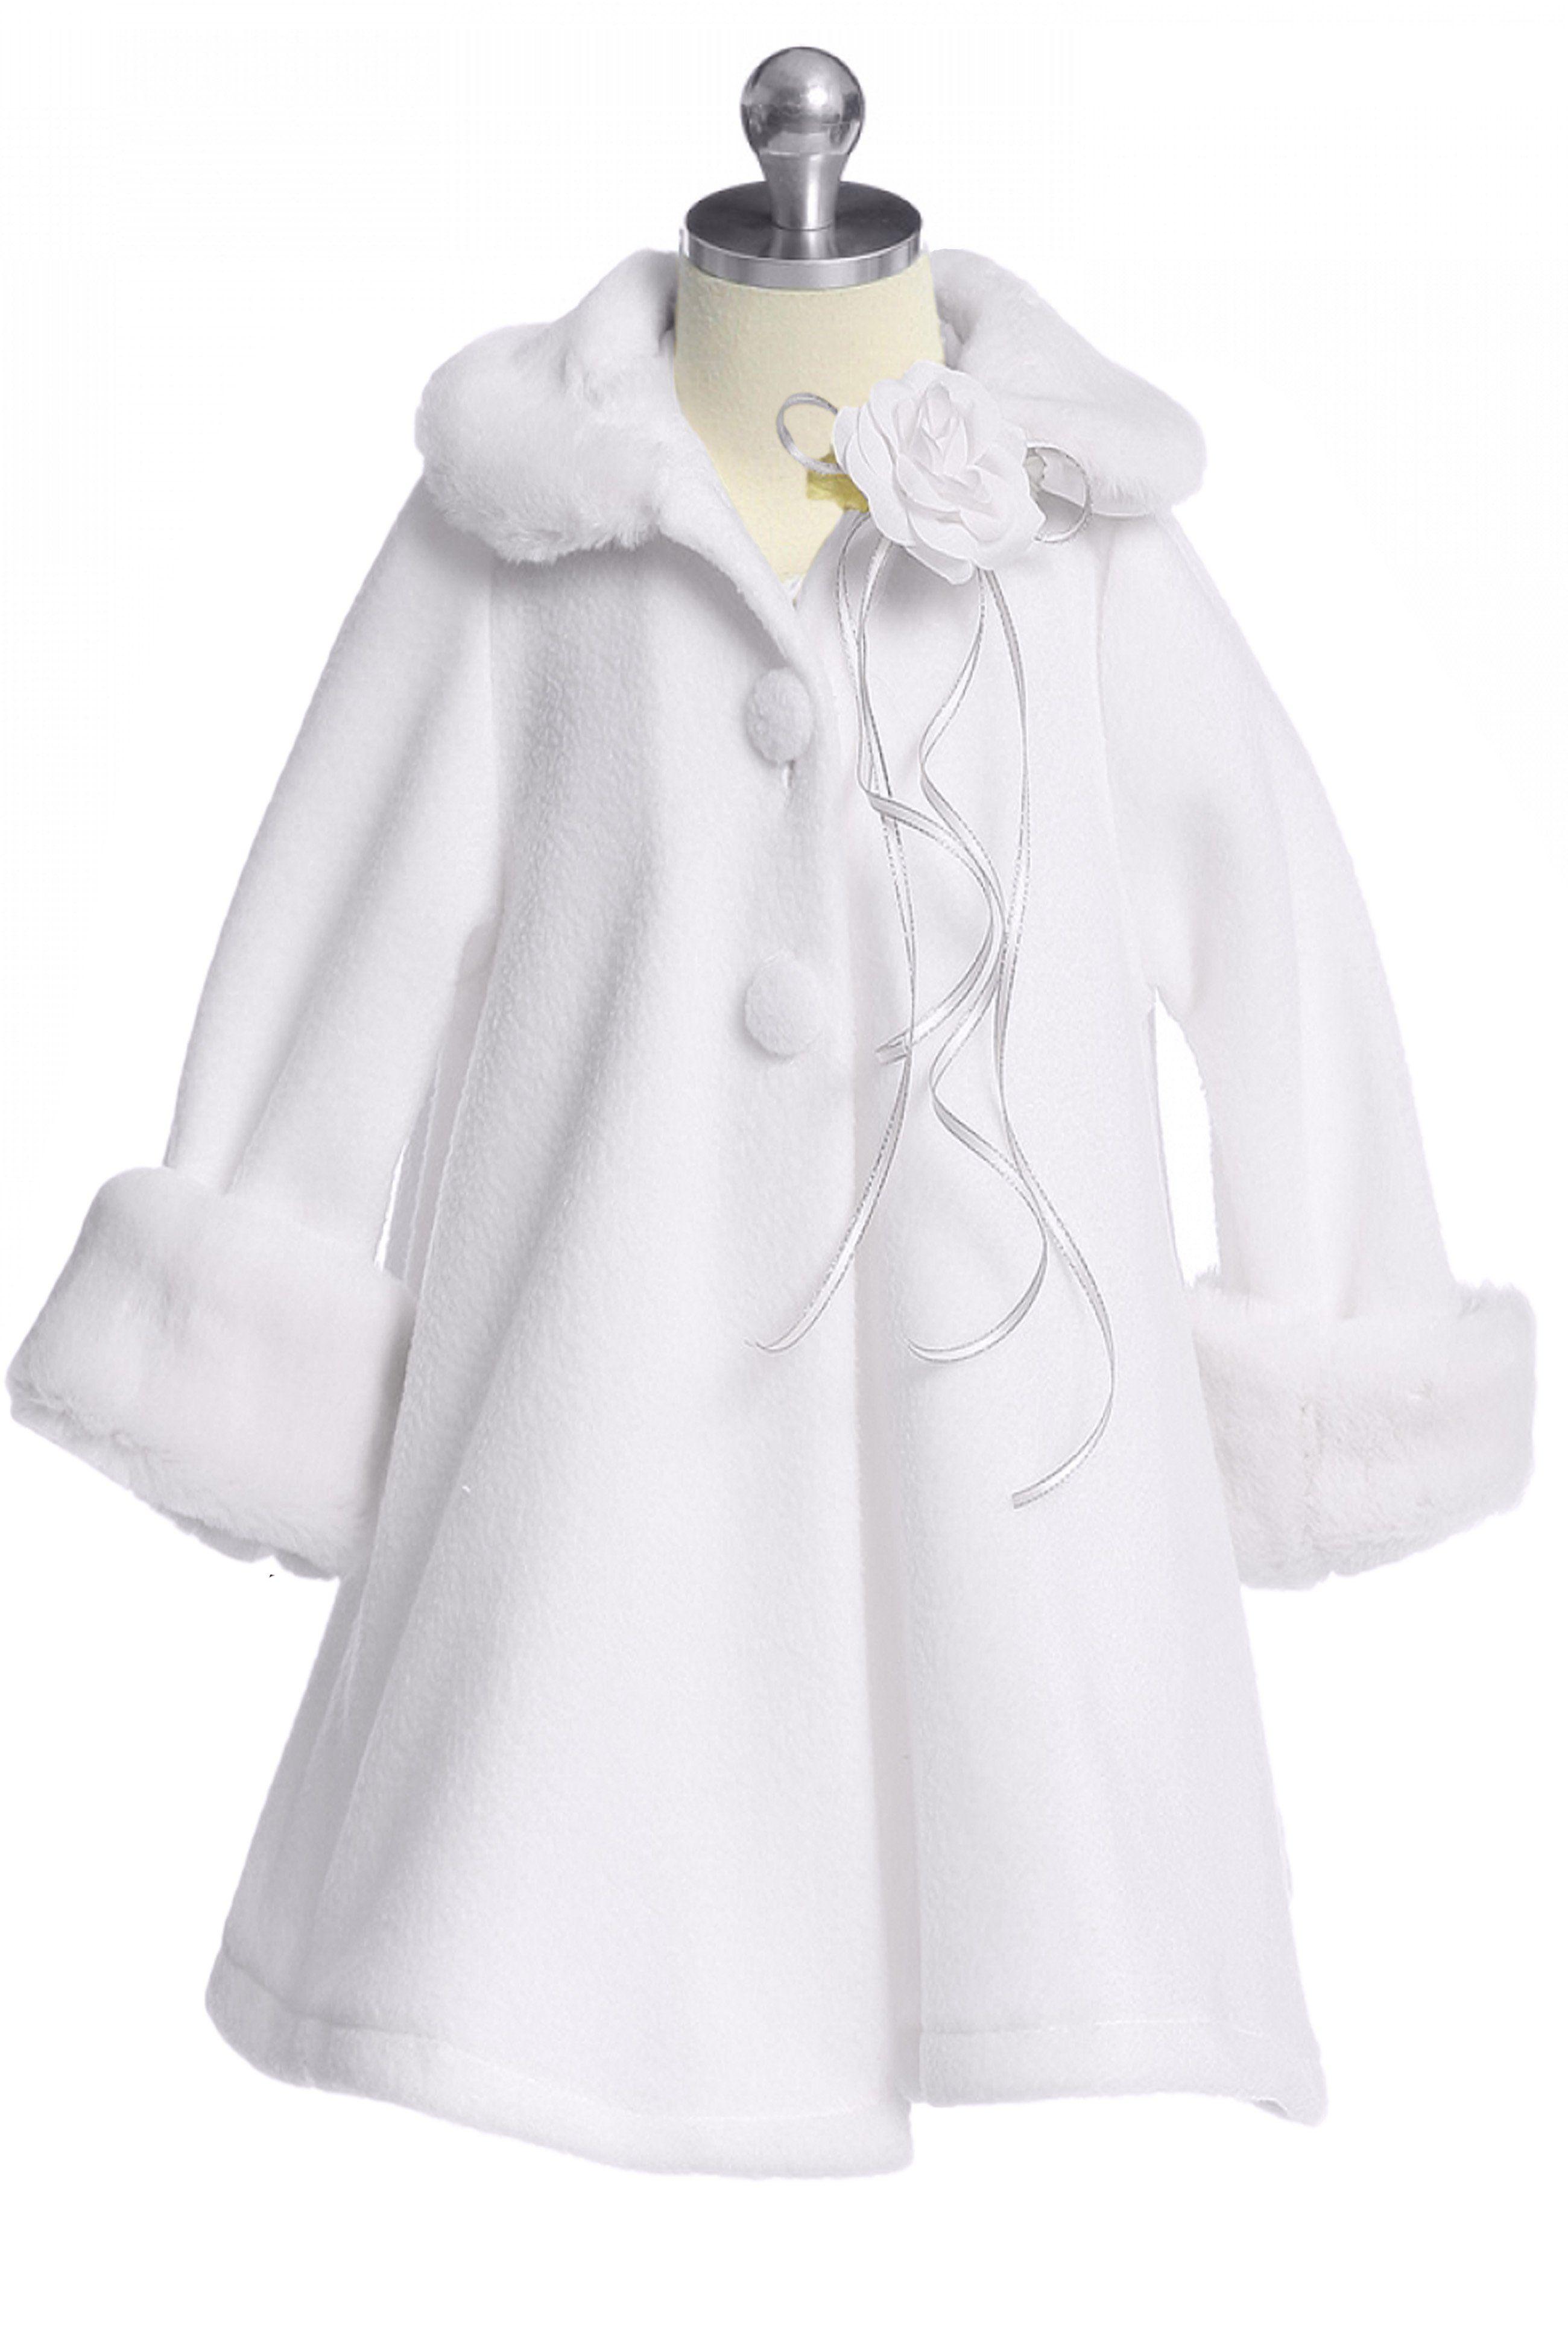 White Fleece Girls Dress Coat With Fur Trim 2 12 Rachel S Promise In 2021 Womens Dress Coats Girls Dress Coats Coat Fashion [ 3900 x 2600 Pixel ]